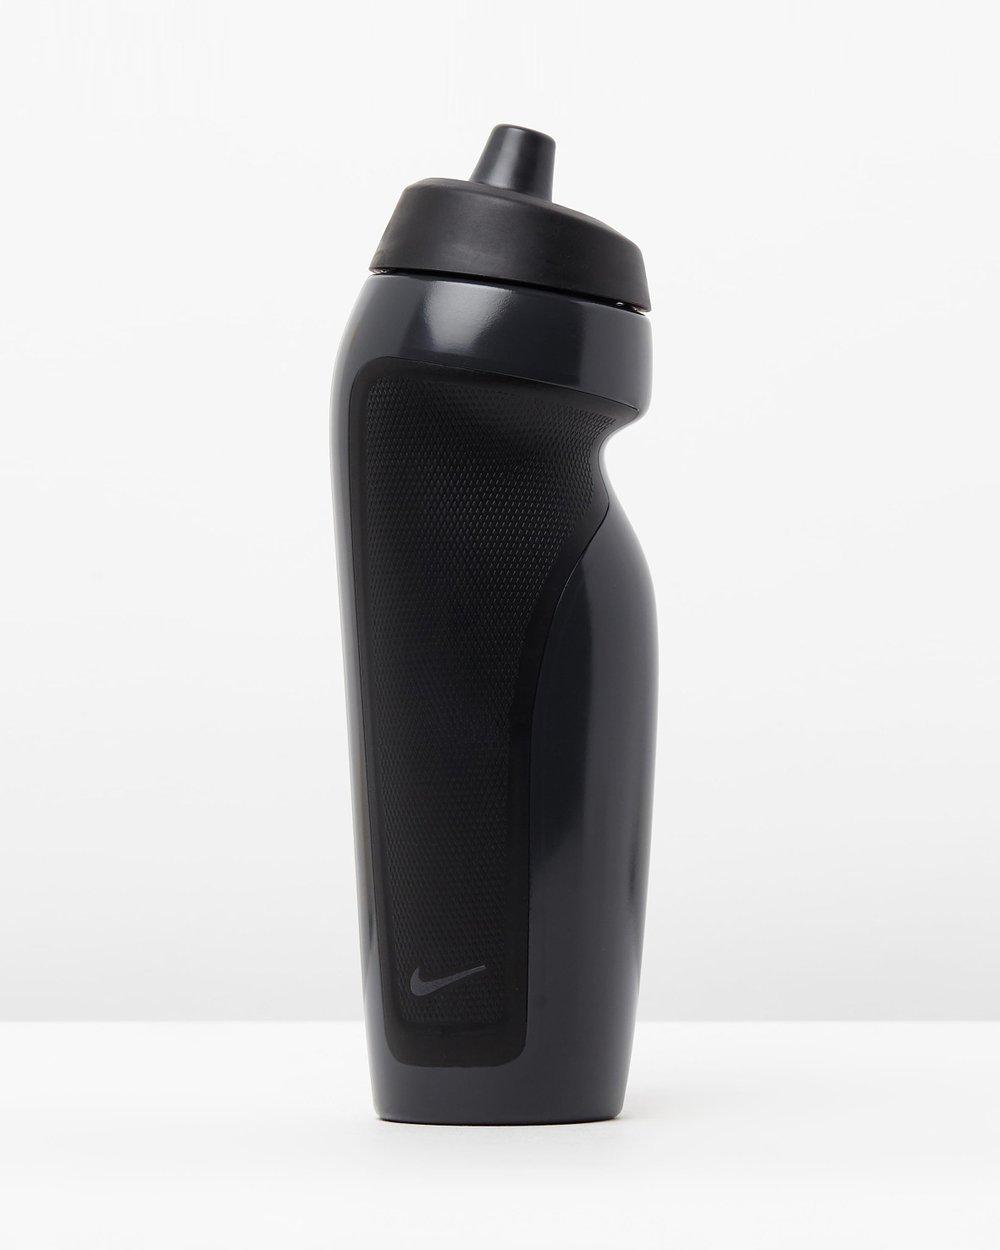 22b47f9202cb3 Nike Sport Water Bottle 20oz by Nike Online   THE ICONIC   Australia